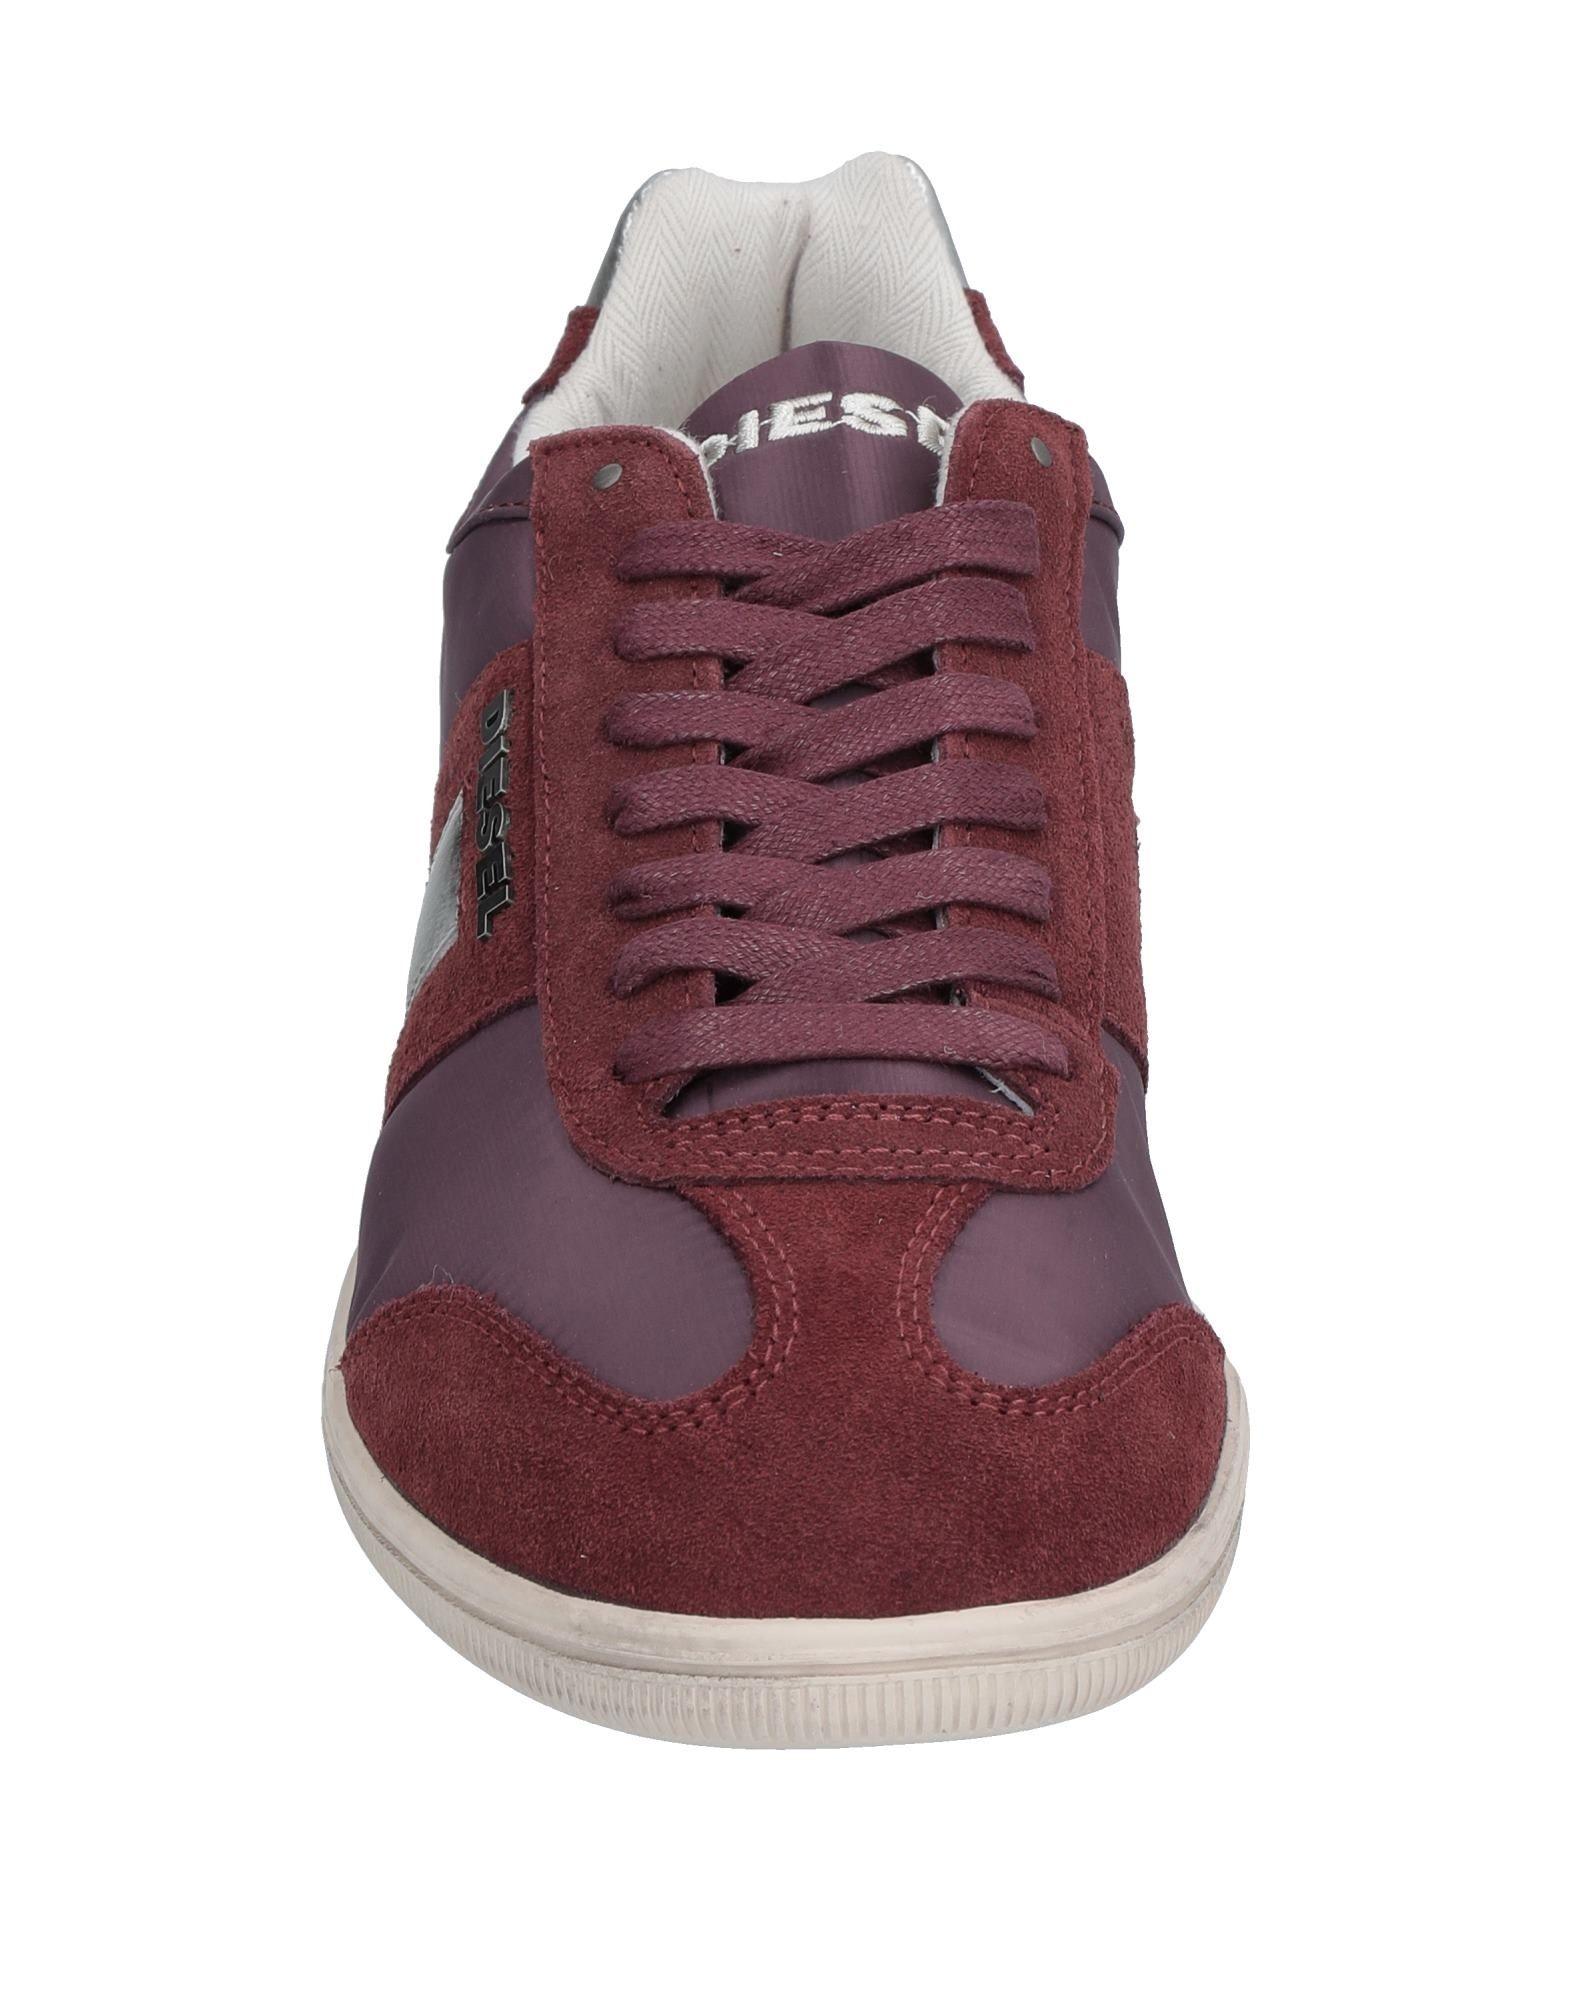 Diesel Sneakers Herren  Schuhe 11067456PB Heiße Schuhe  074987